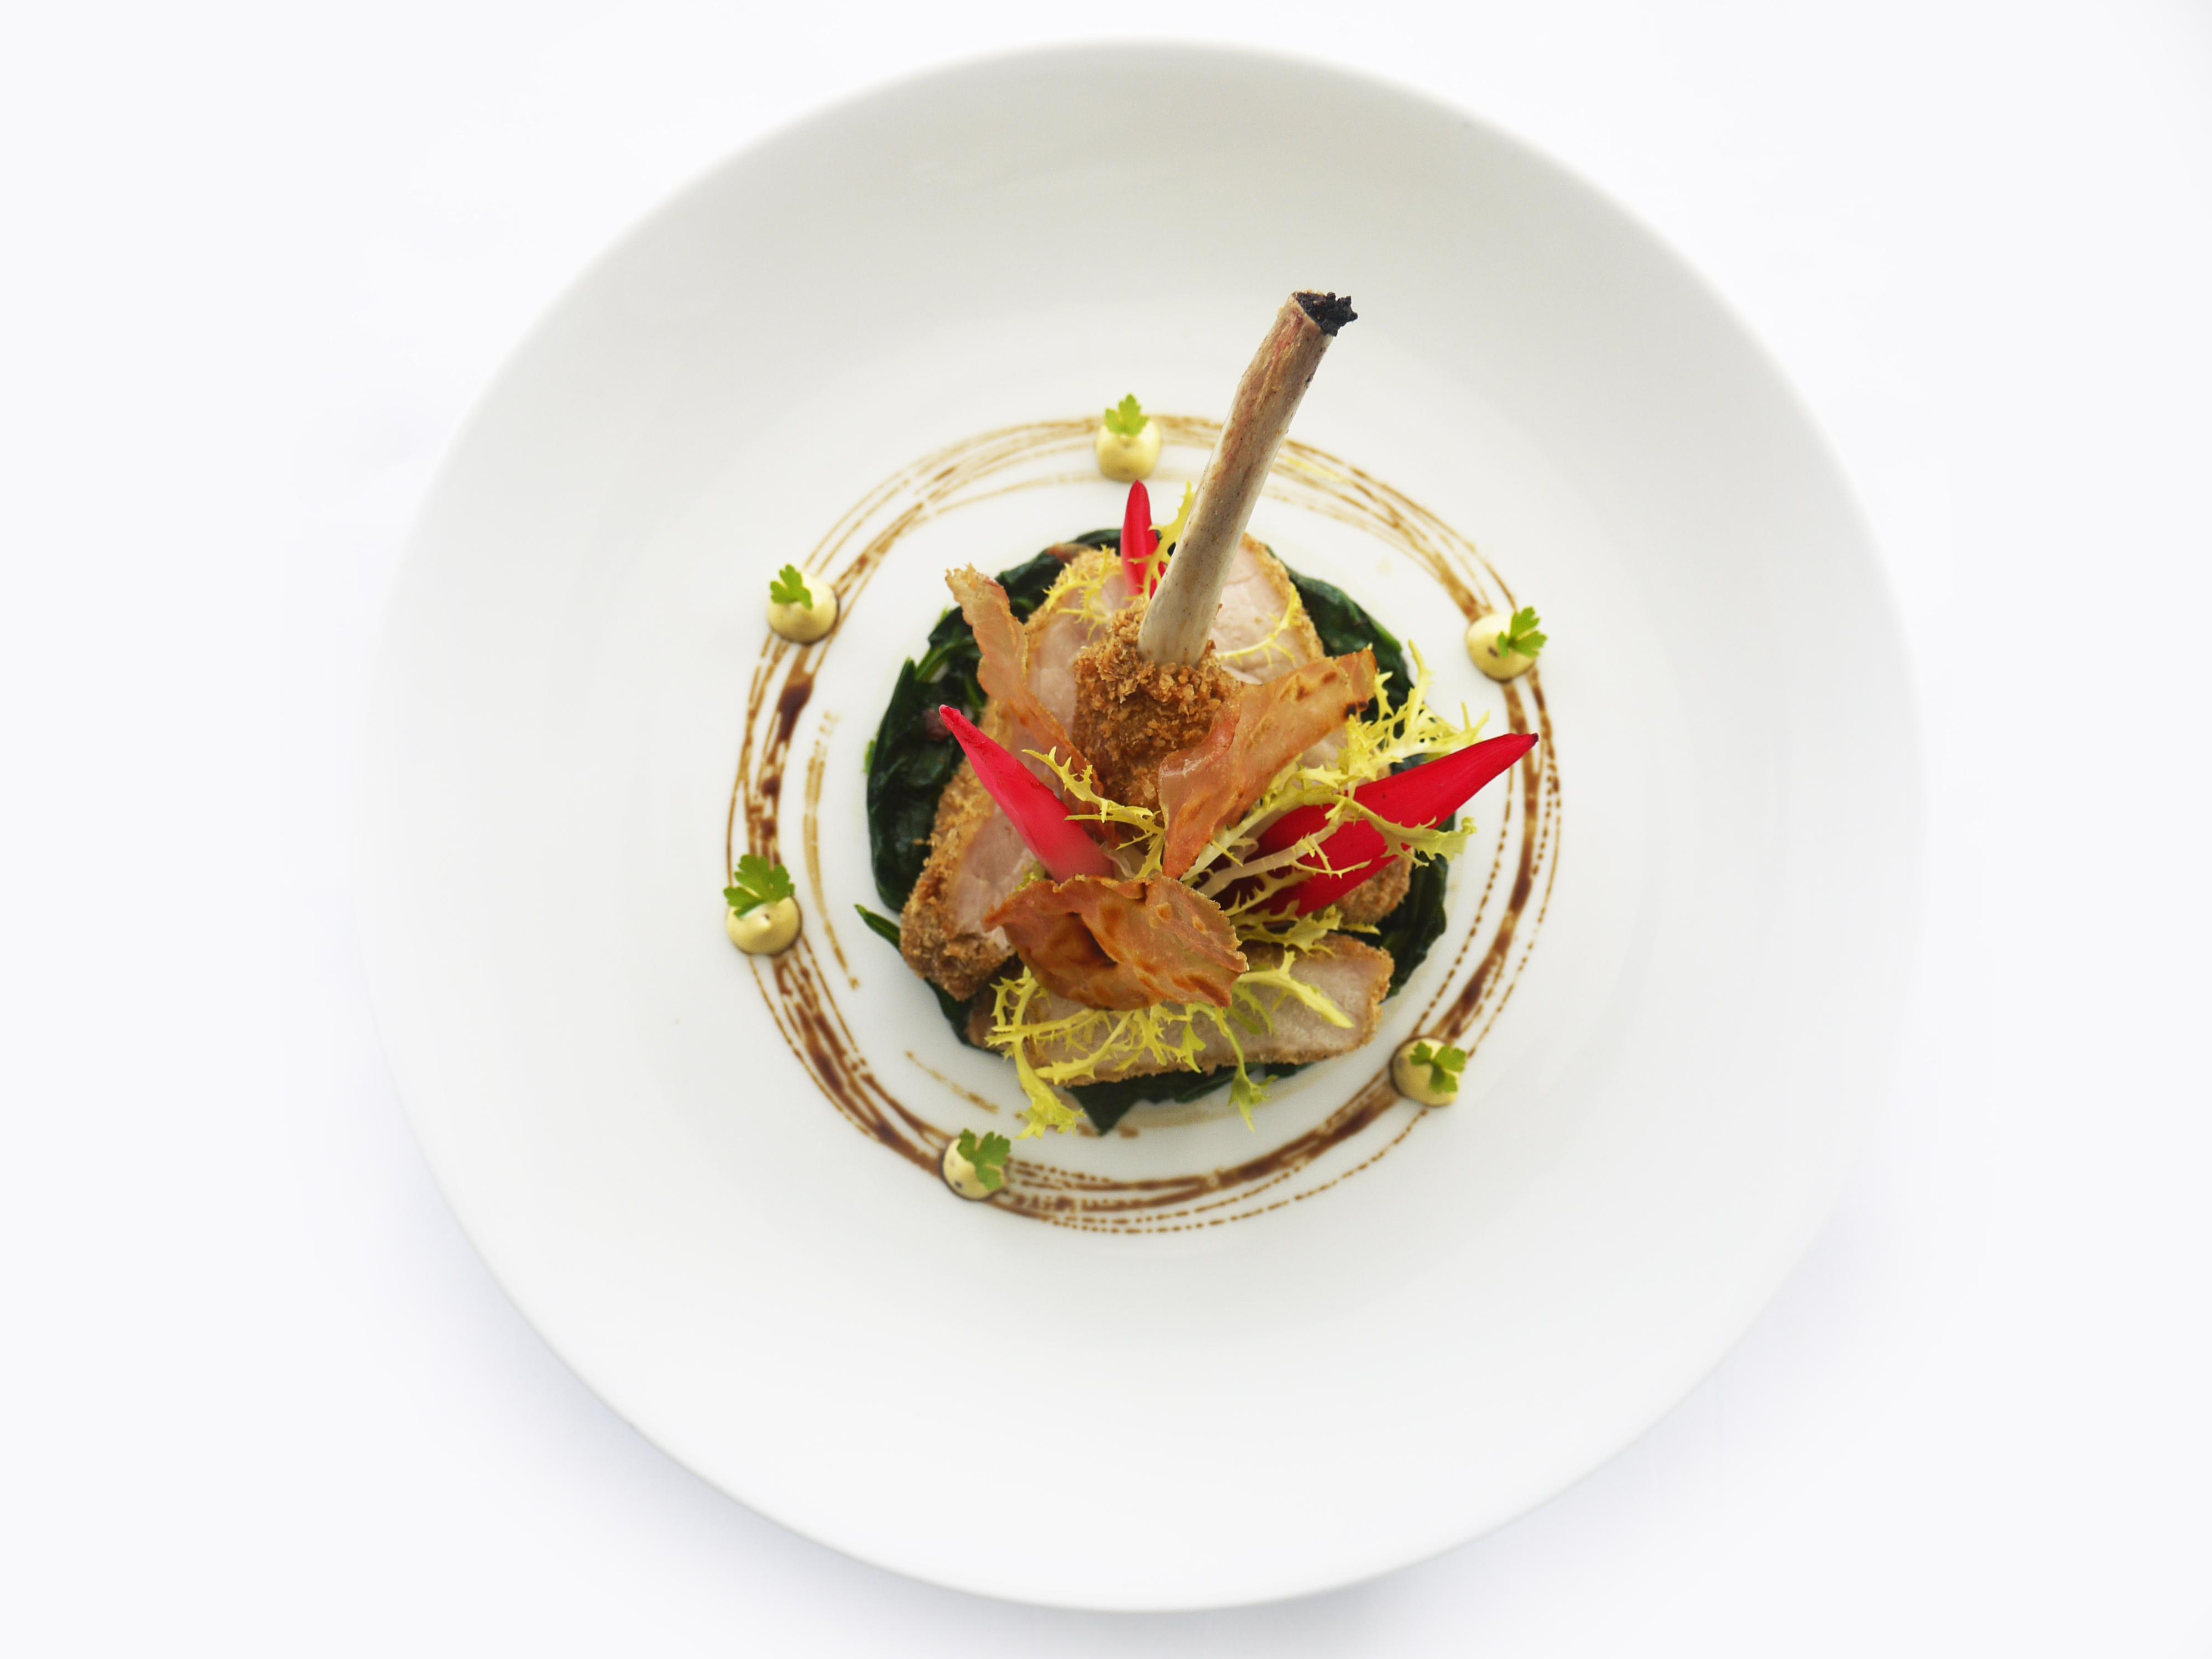 ilLido - AUTUMN 2014 Kurobuta Pork Chop Milanese with Shallot G